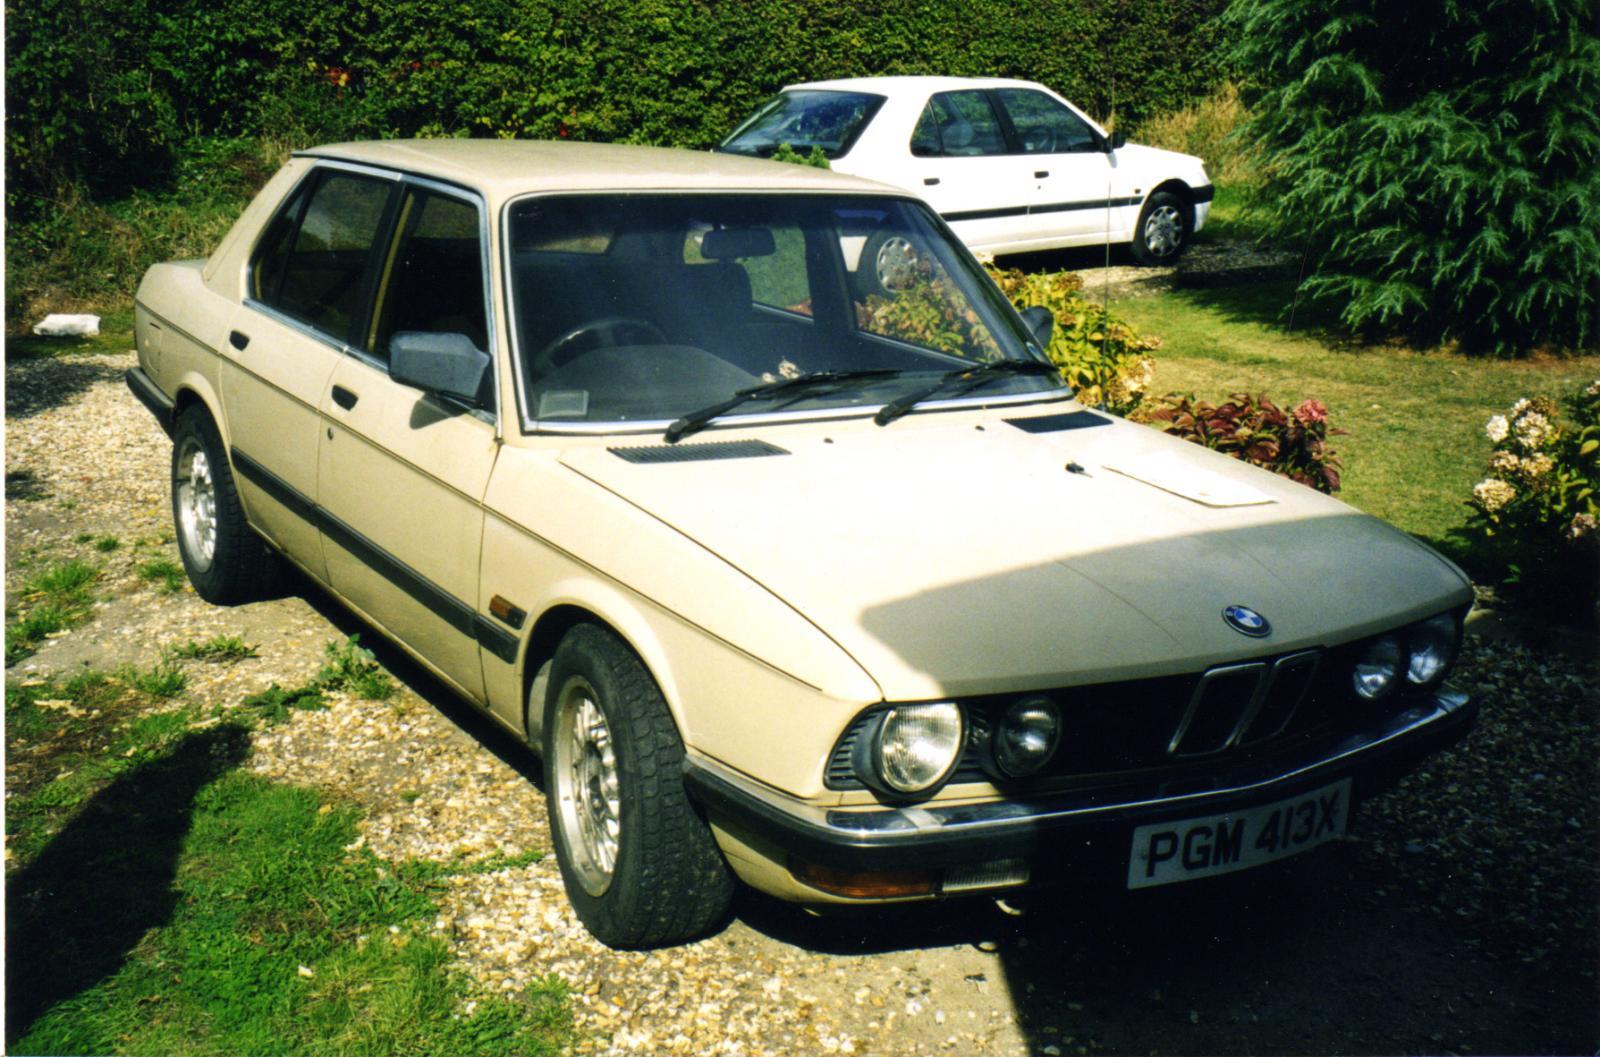 BMW 525i front n-s PGM 413X.jpg